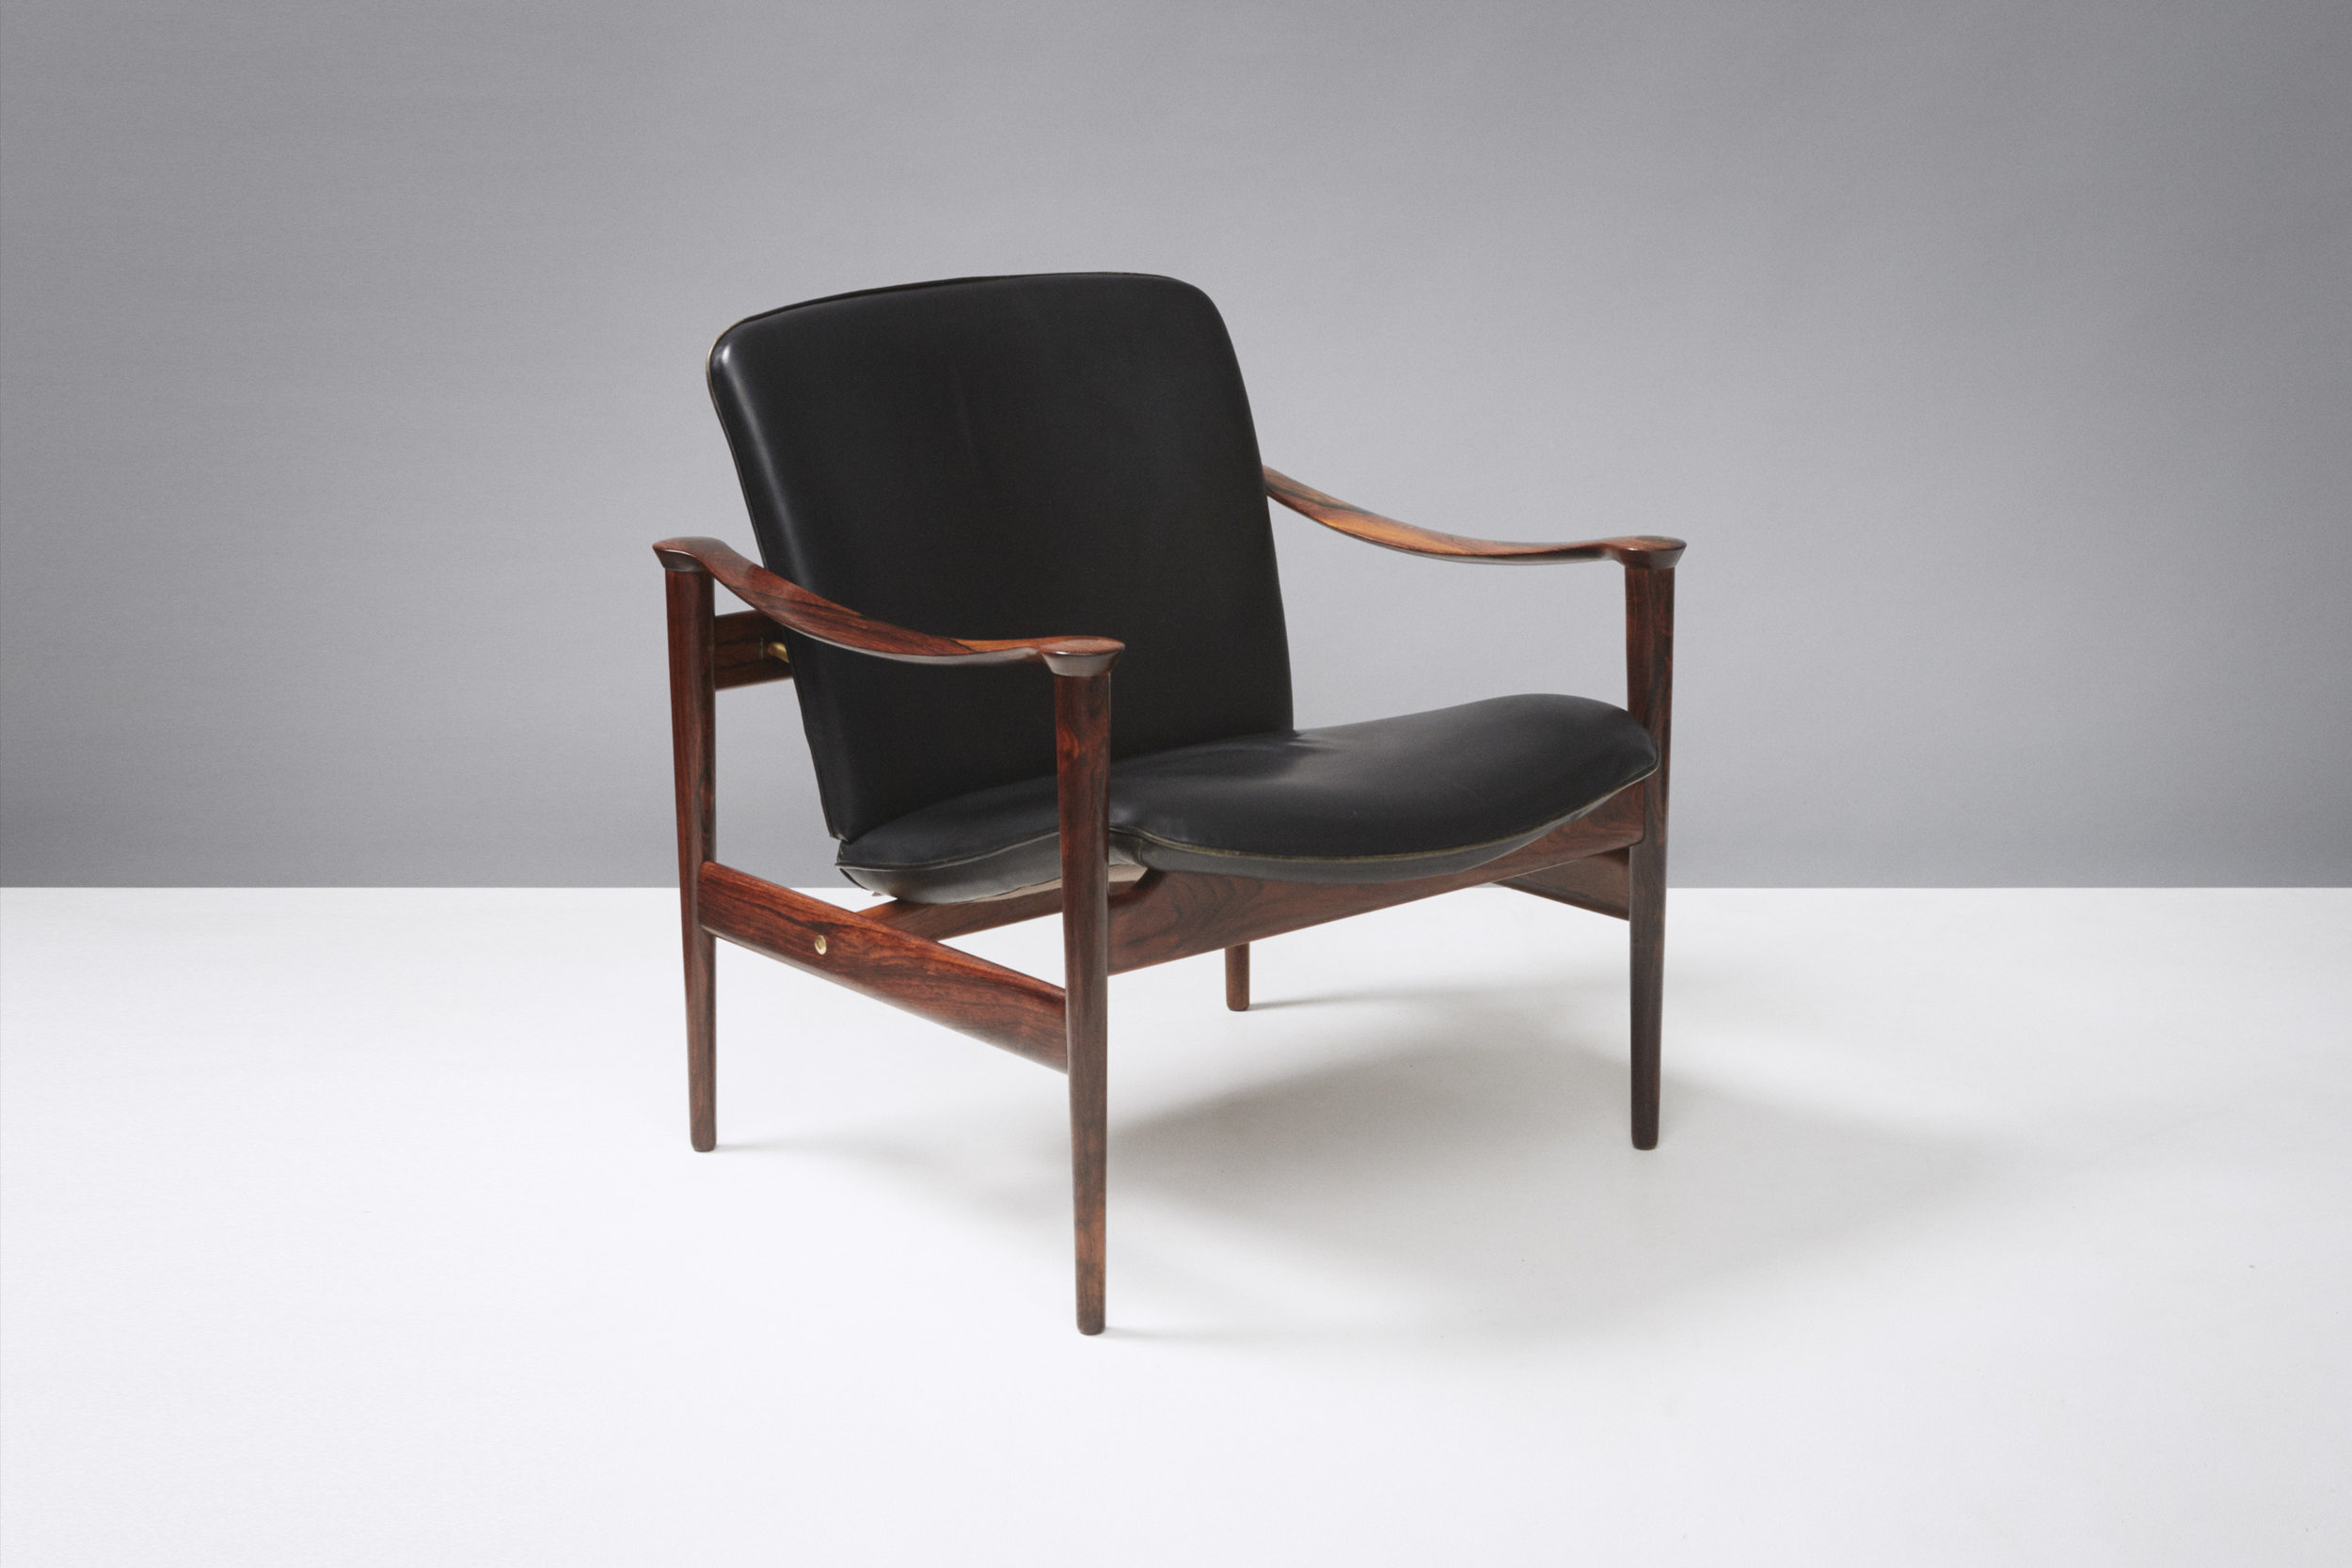 Fredrik Kayser  Model 711 Chair, Rosewood